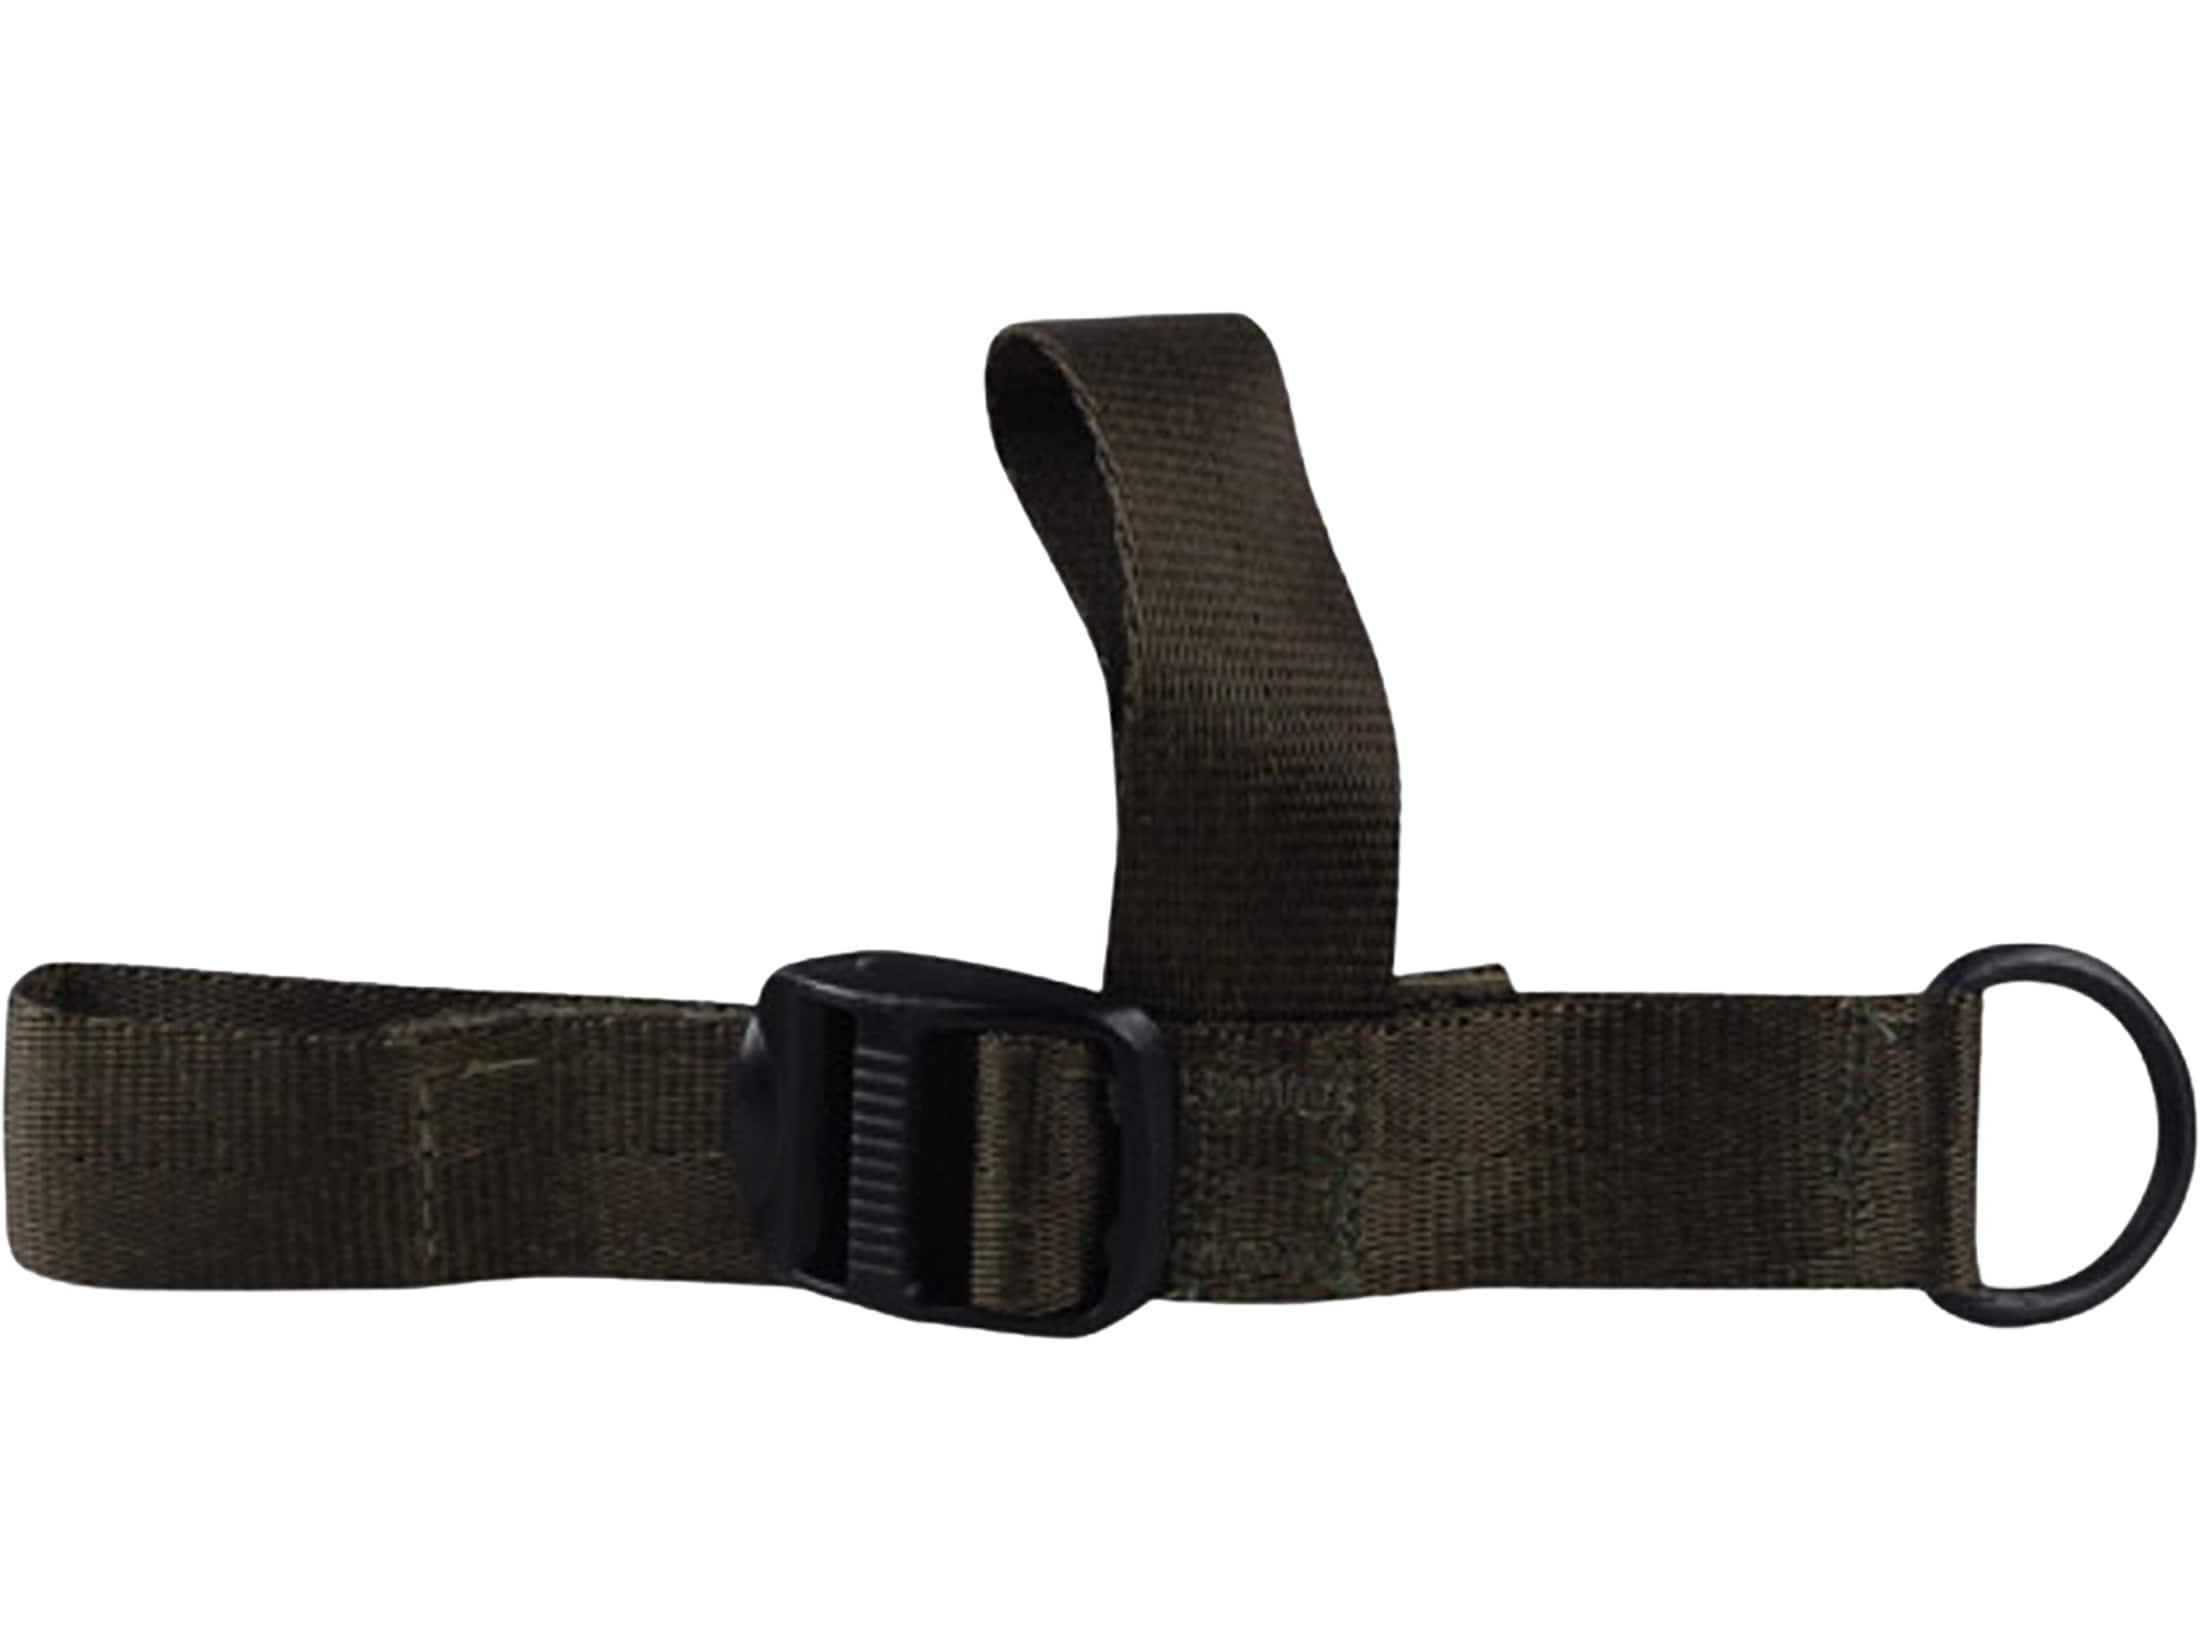 Buttstock Rifle Sling Adaptateur